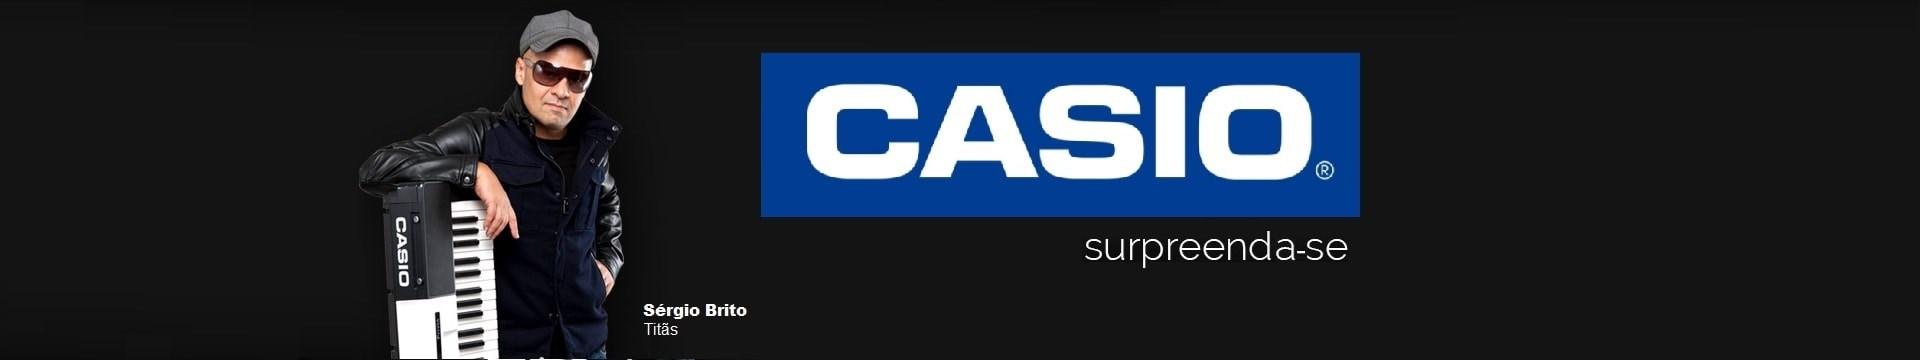 Casio, Surpreenda-se